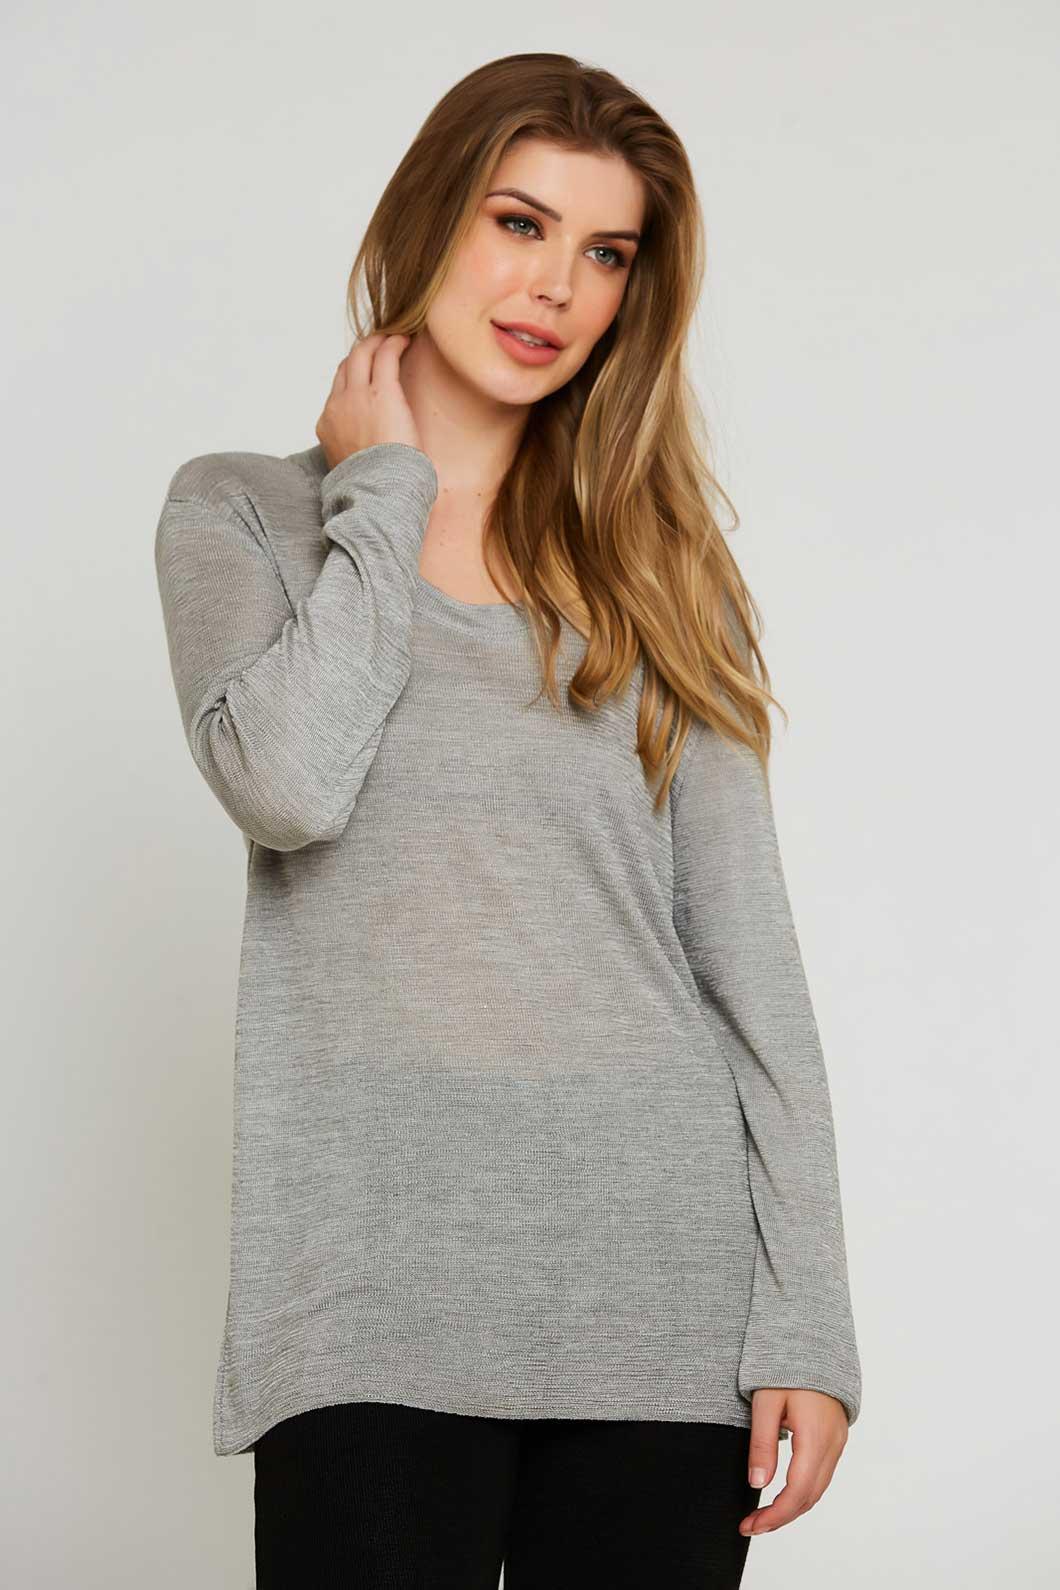 Blusa de Tricot decote redondo - Prata